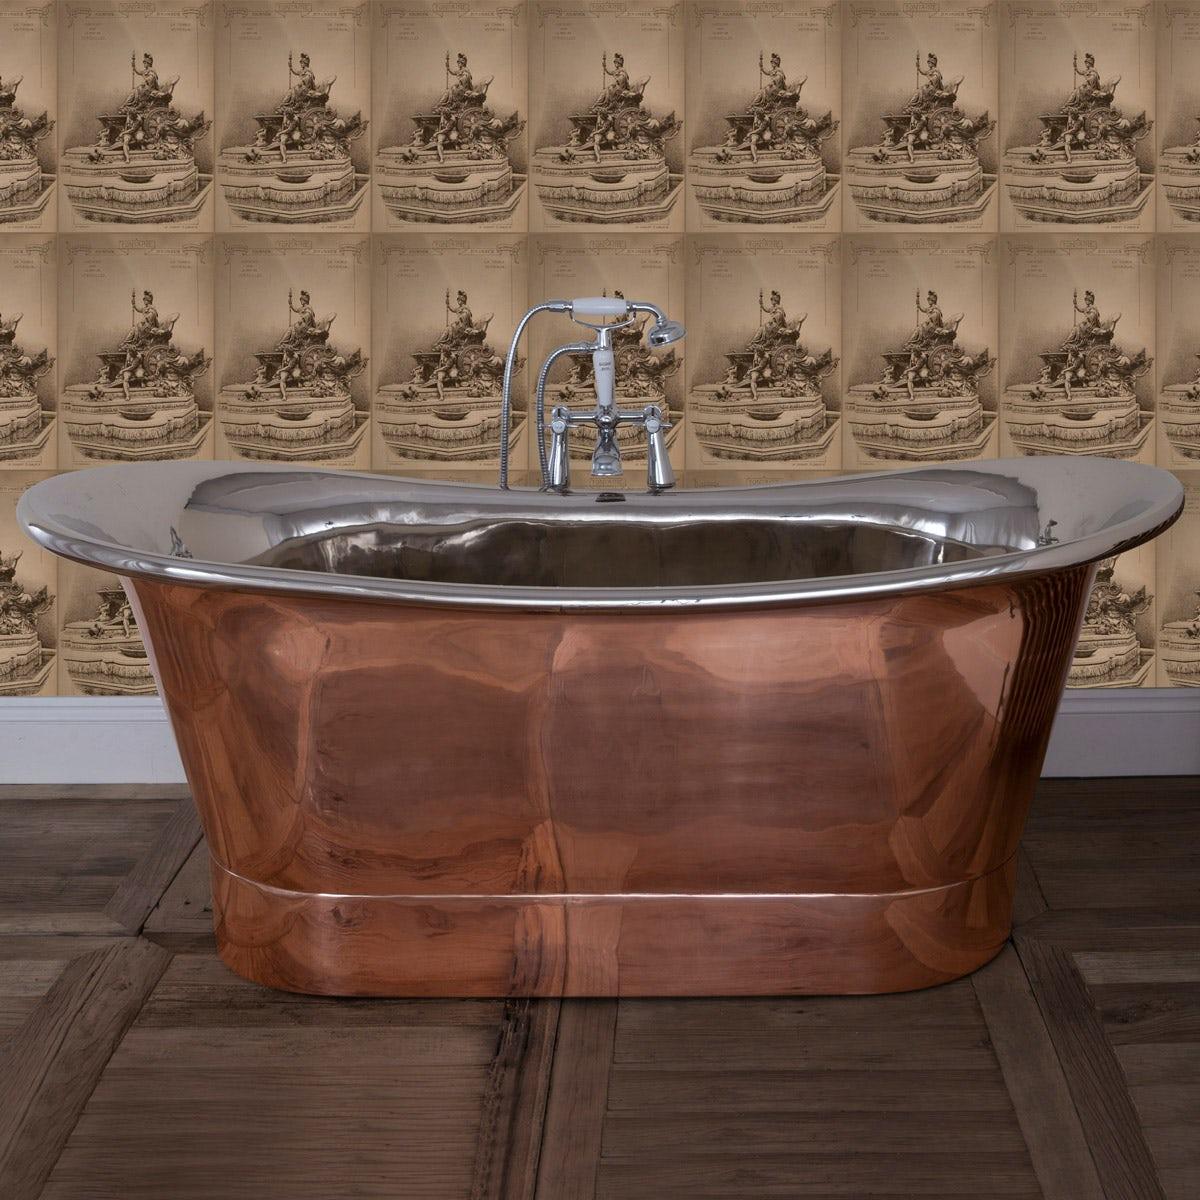 The Bath Co. Rembrandt copper and nickel bath